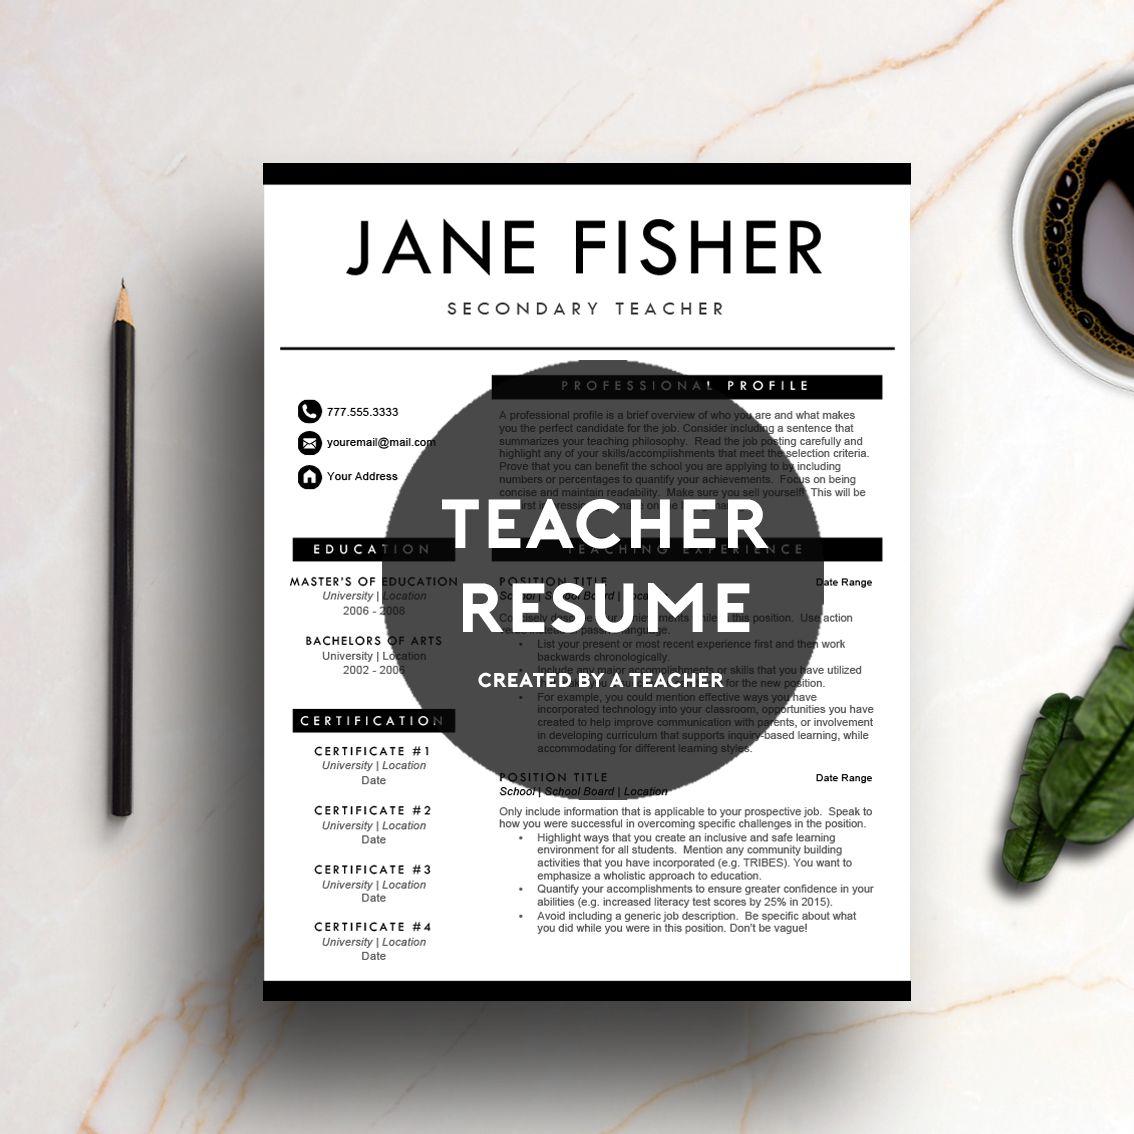 A professionally designed teacher resume template created